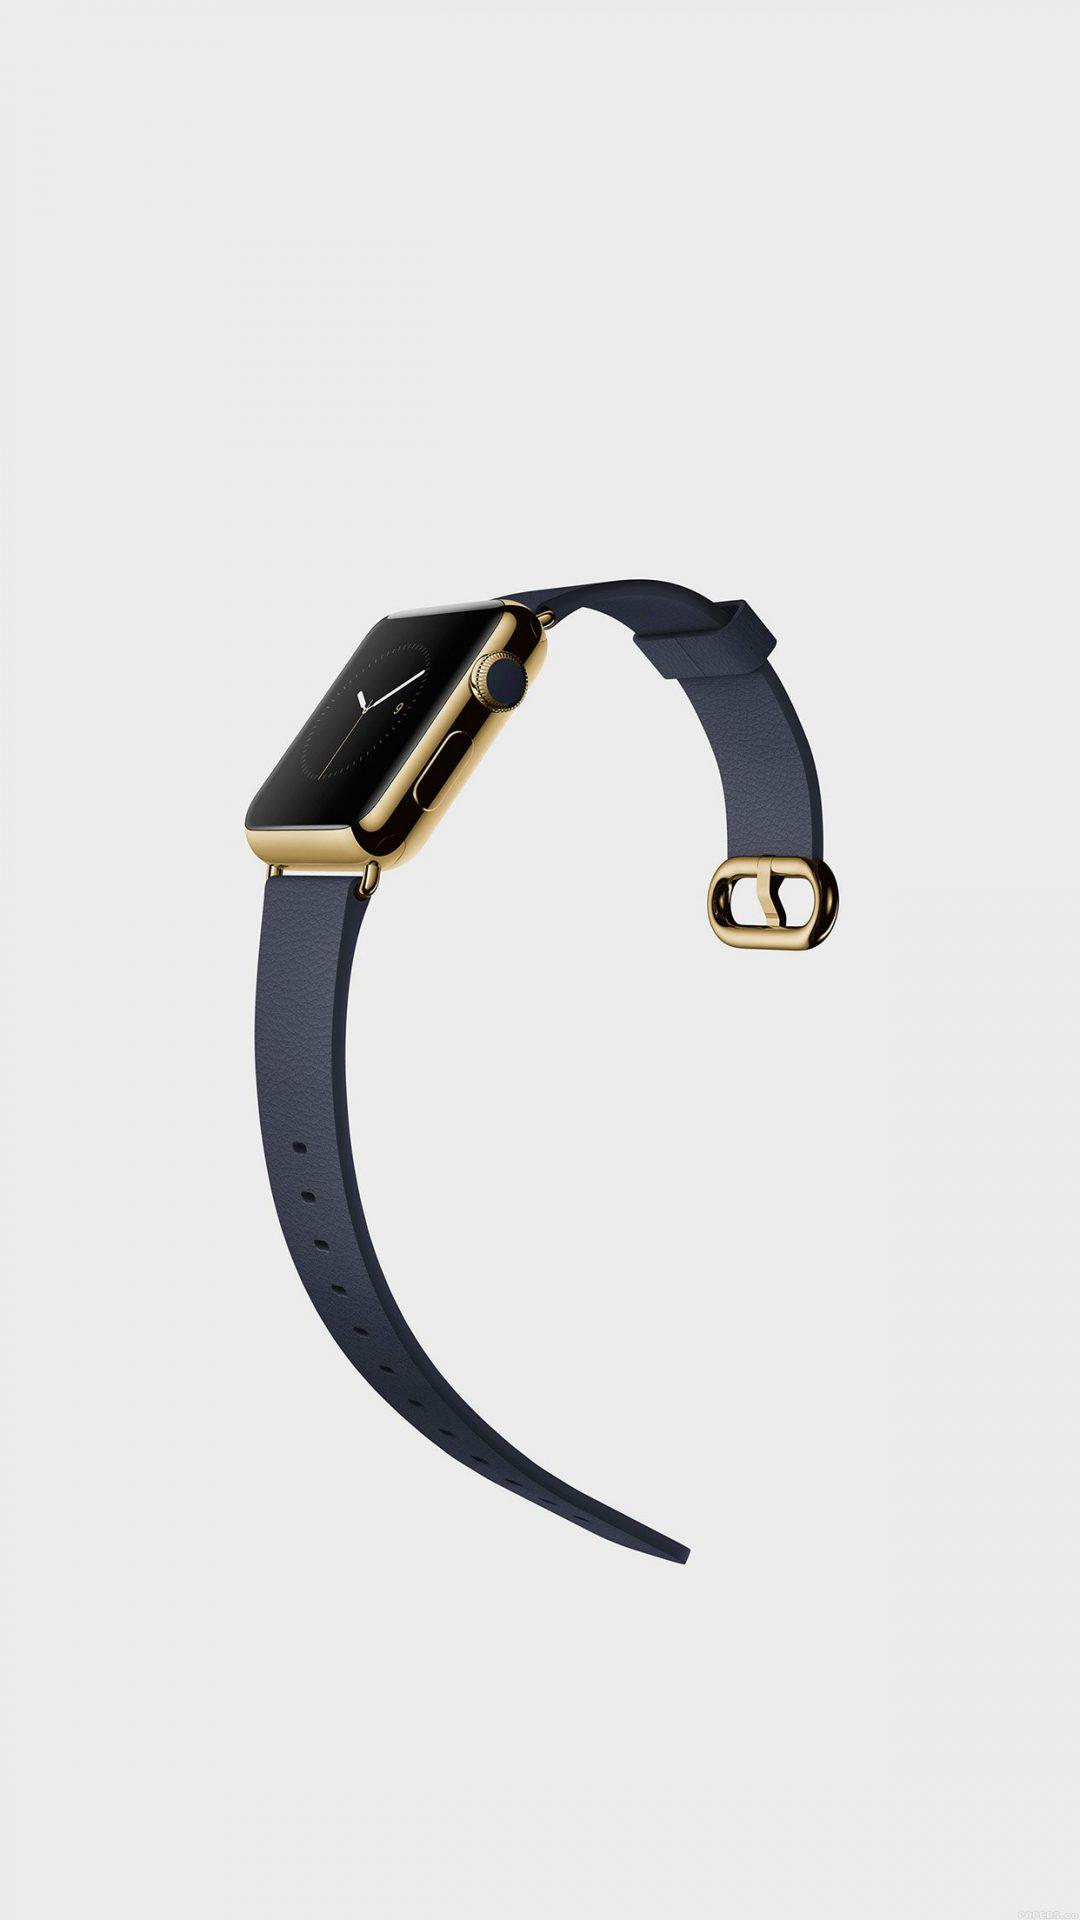 Apple Watch Gold Applewatch Art